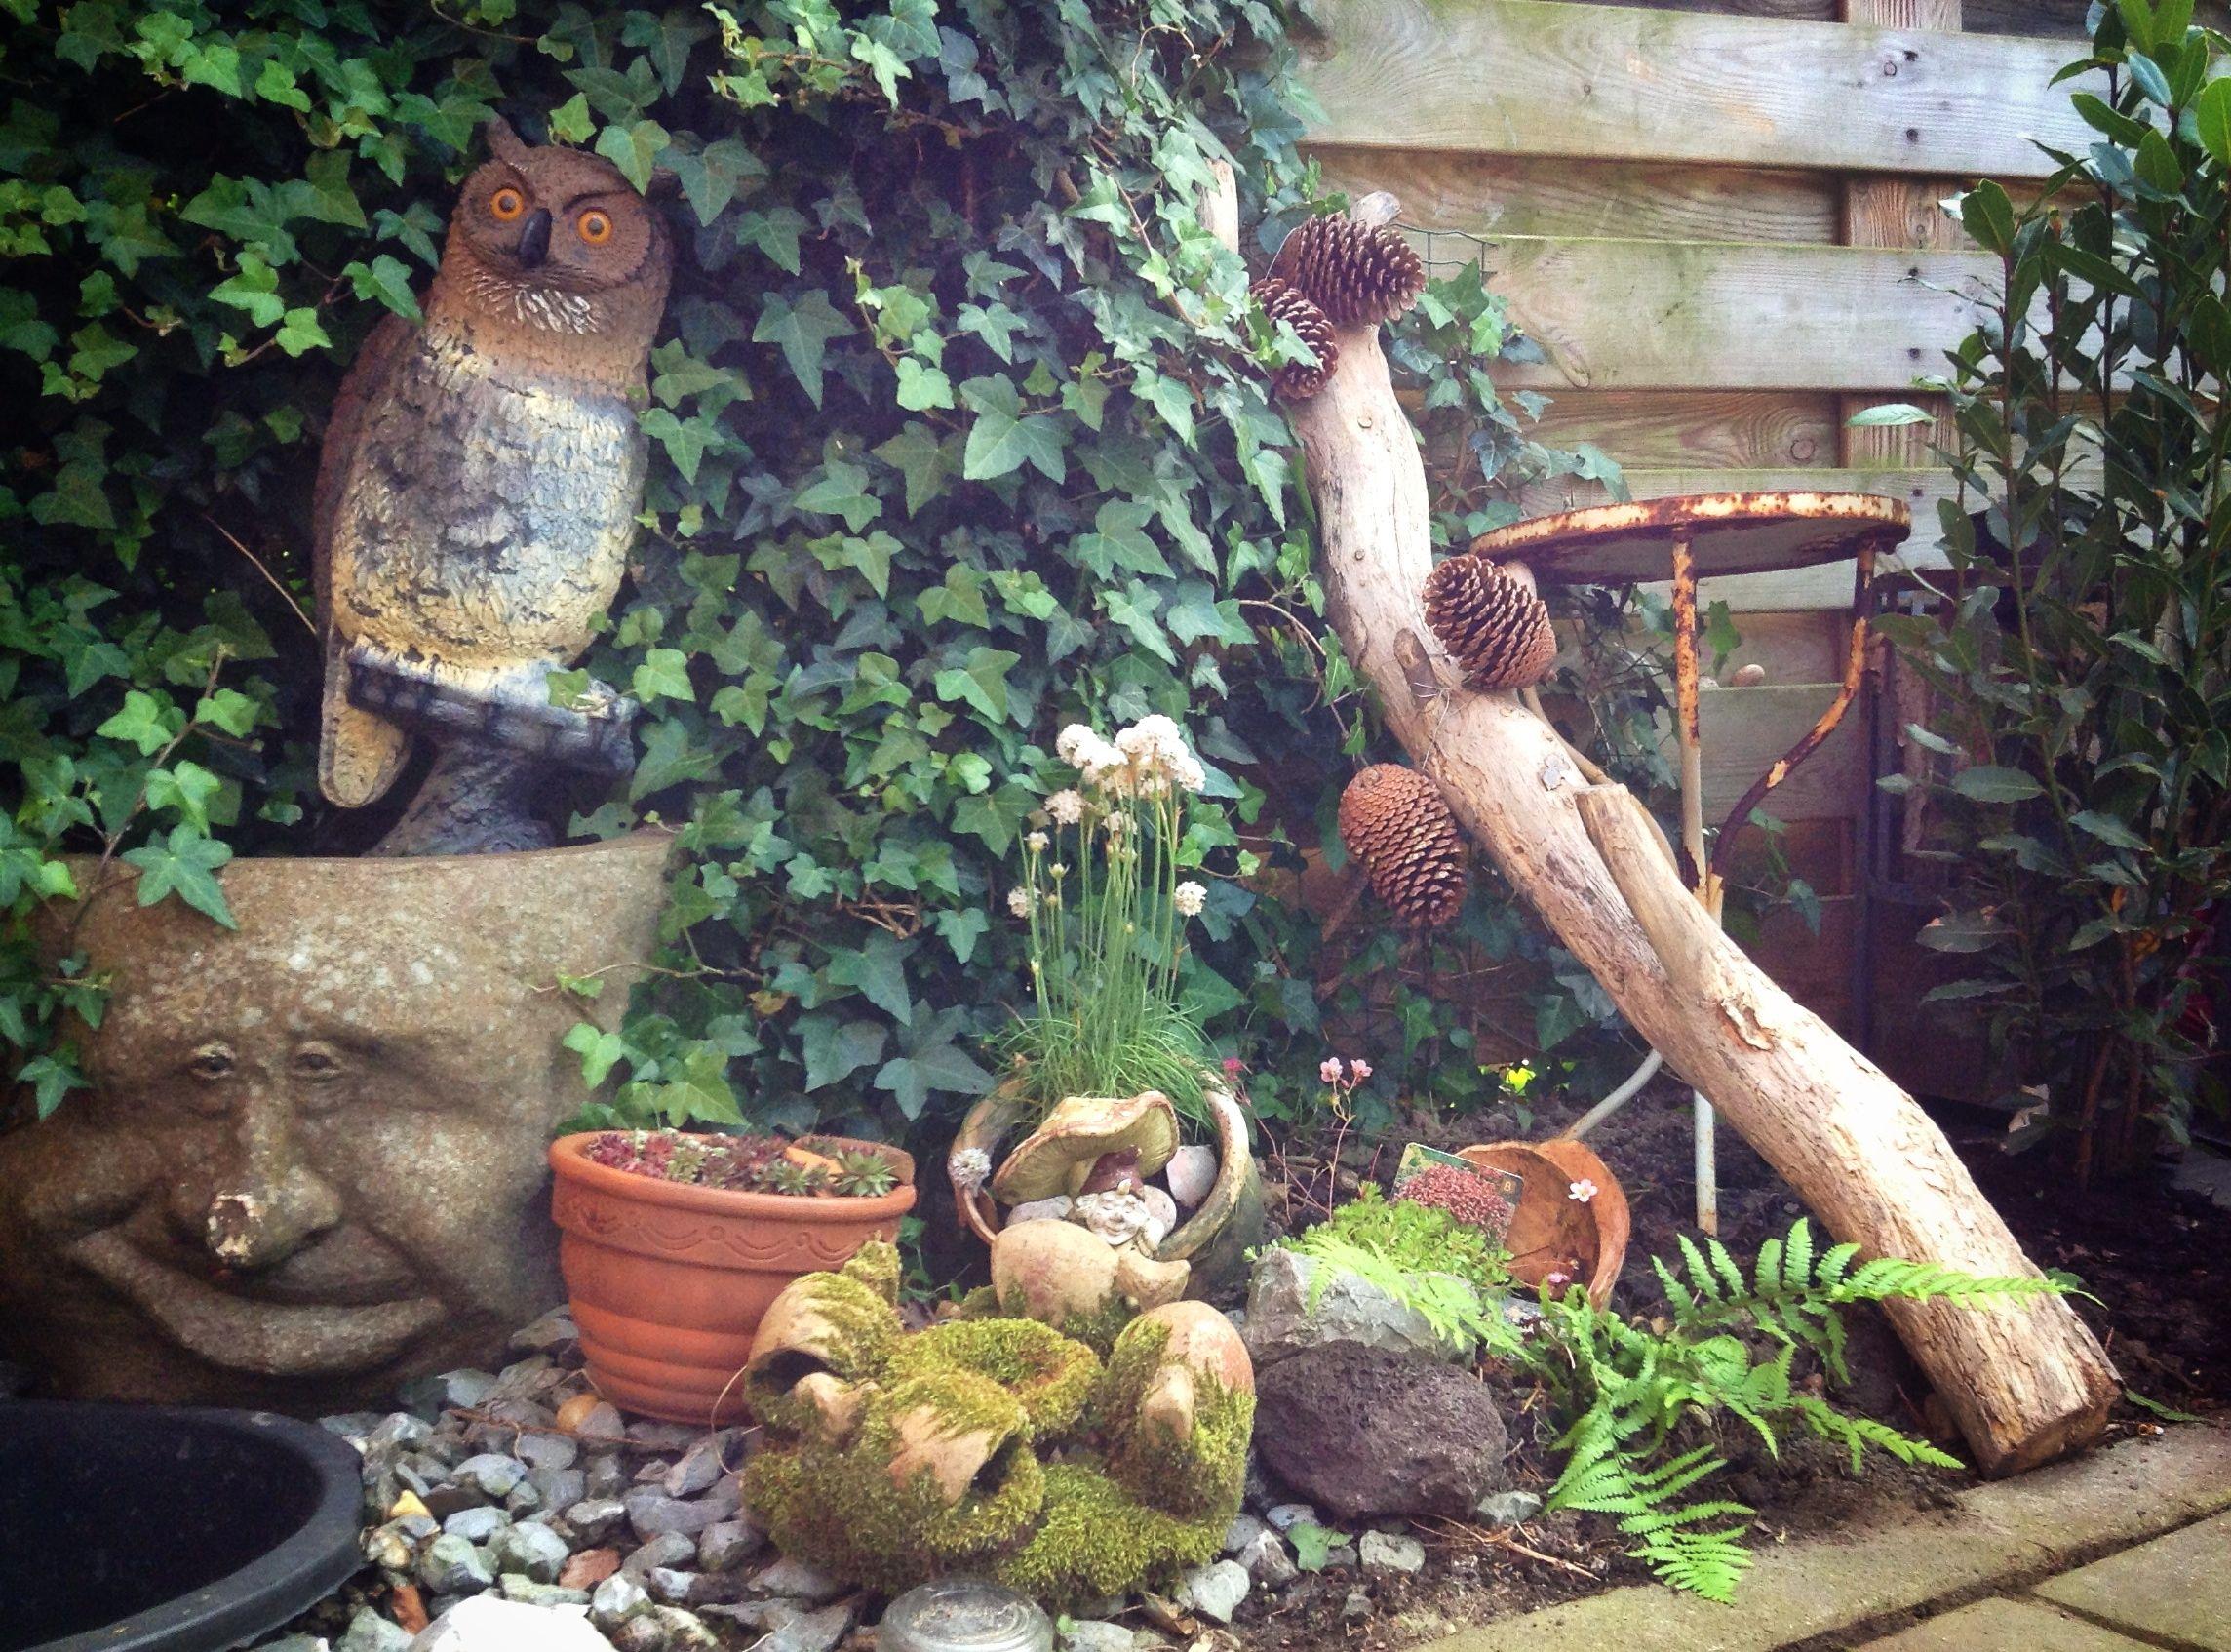 Sprookjesachtig hoekje in m'n tuin...